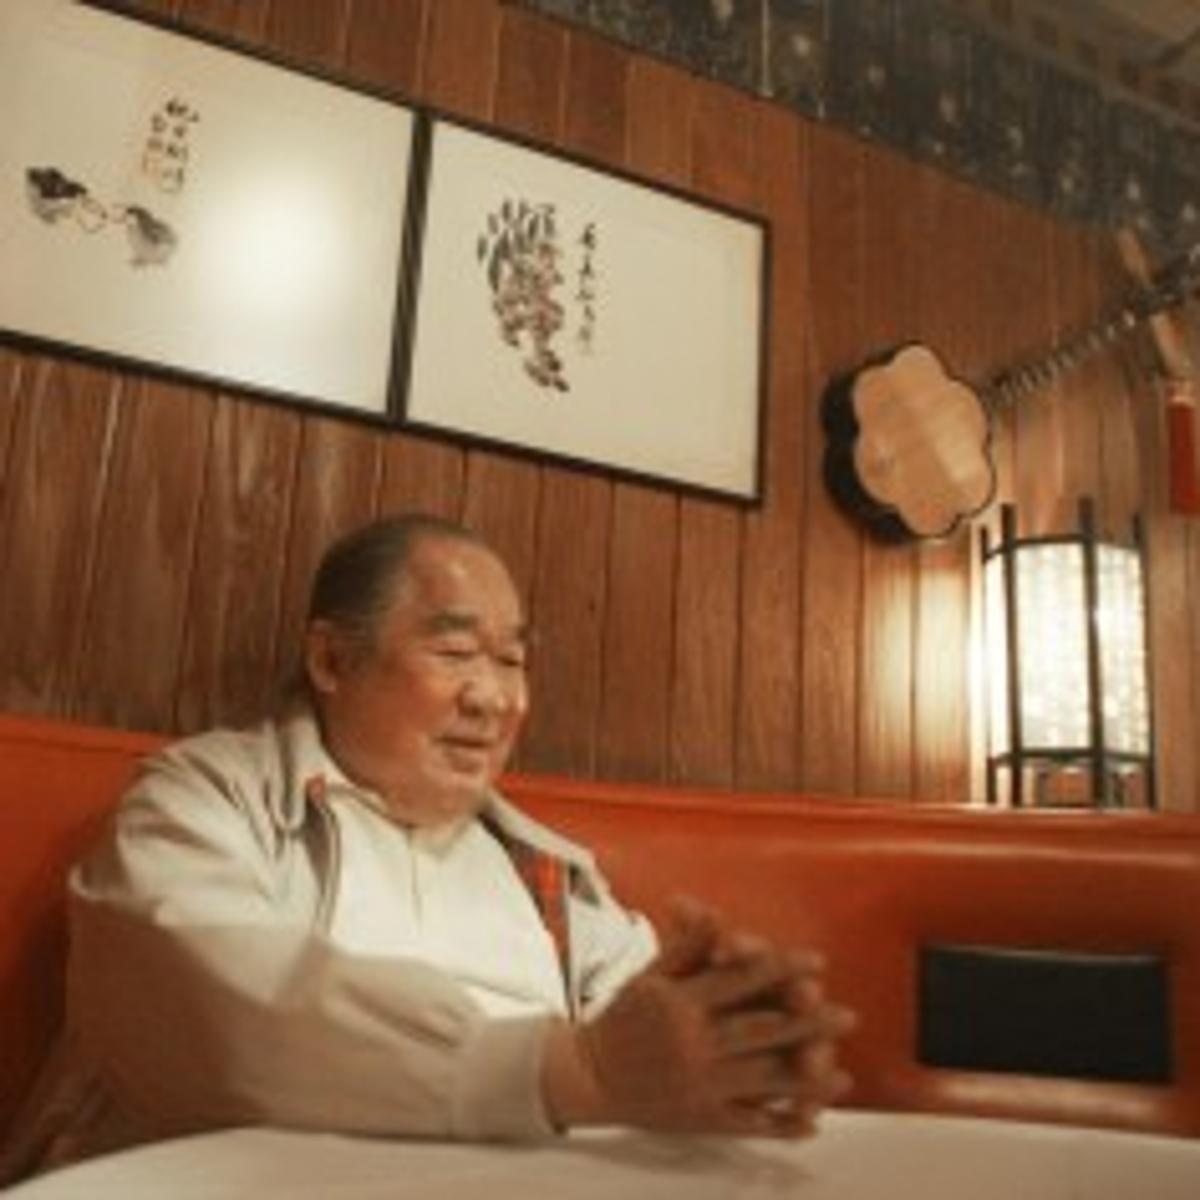 Imperial Dynasty chef Richard Wing dies   Local   hanfordsentinel.com